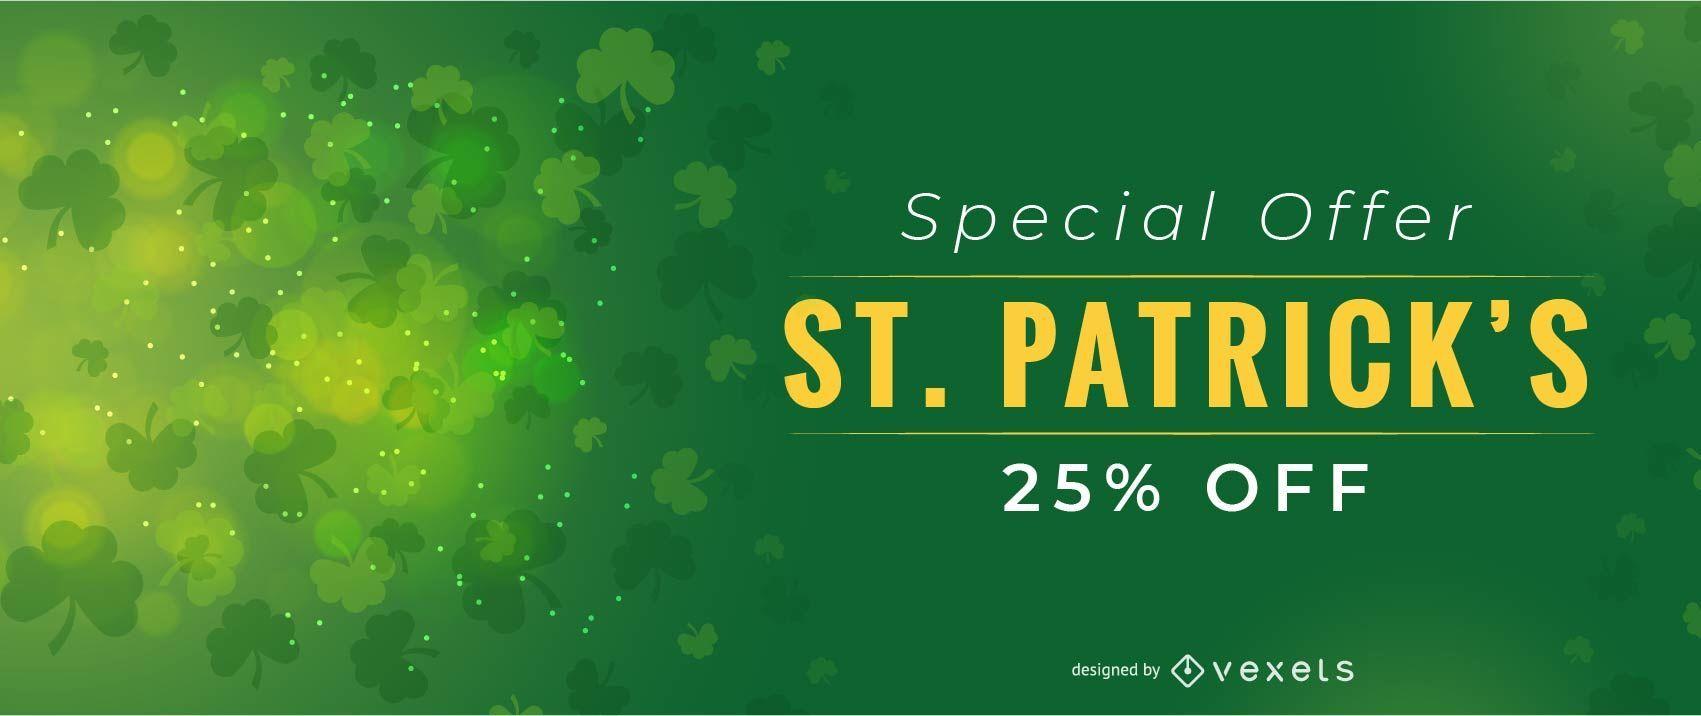 Saint Patrick's Special Offer Design